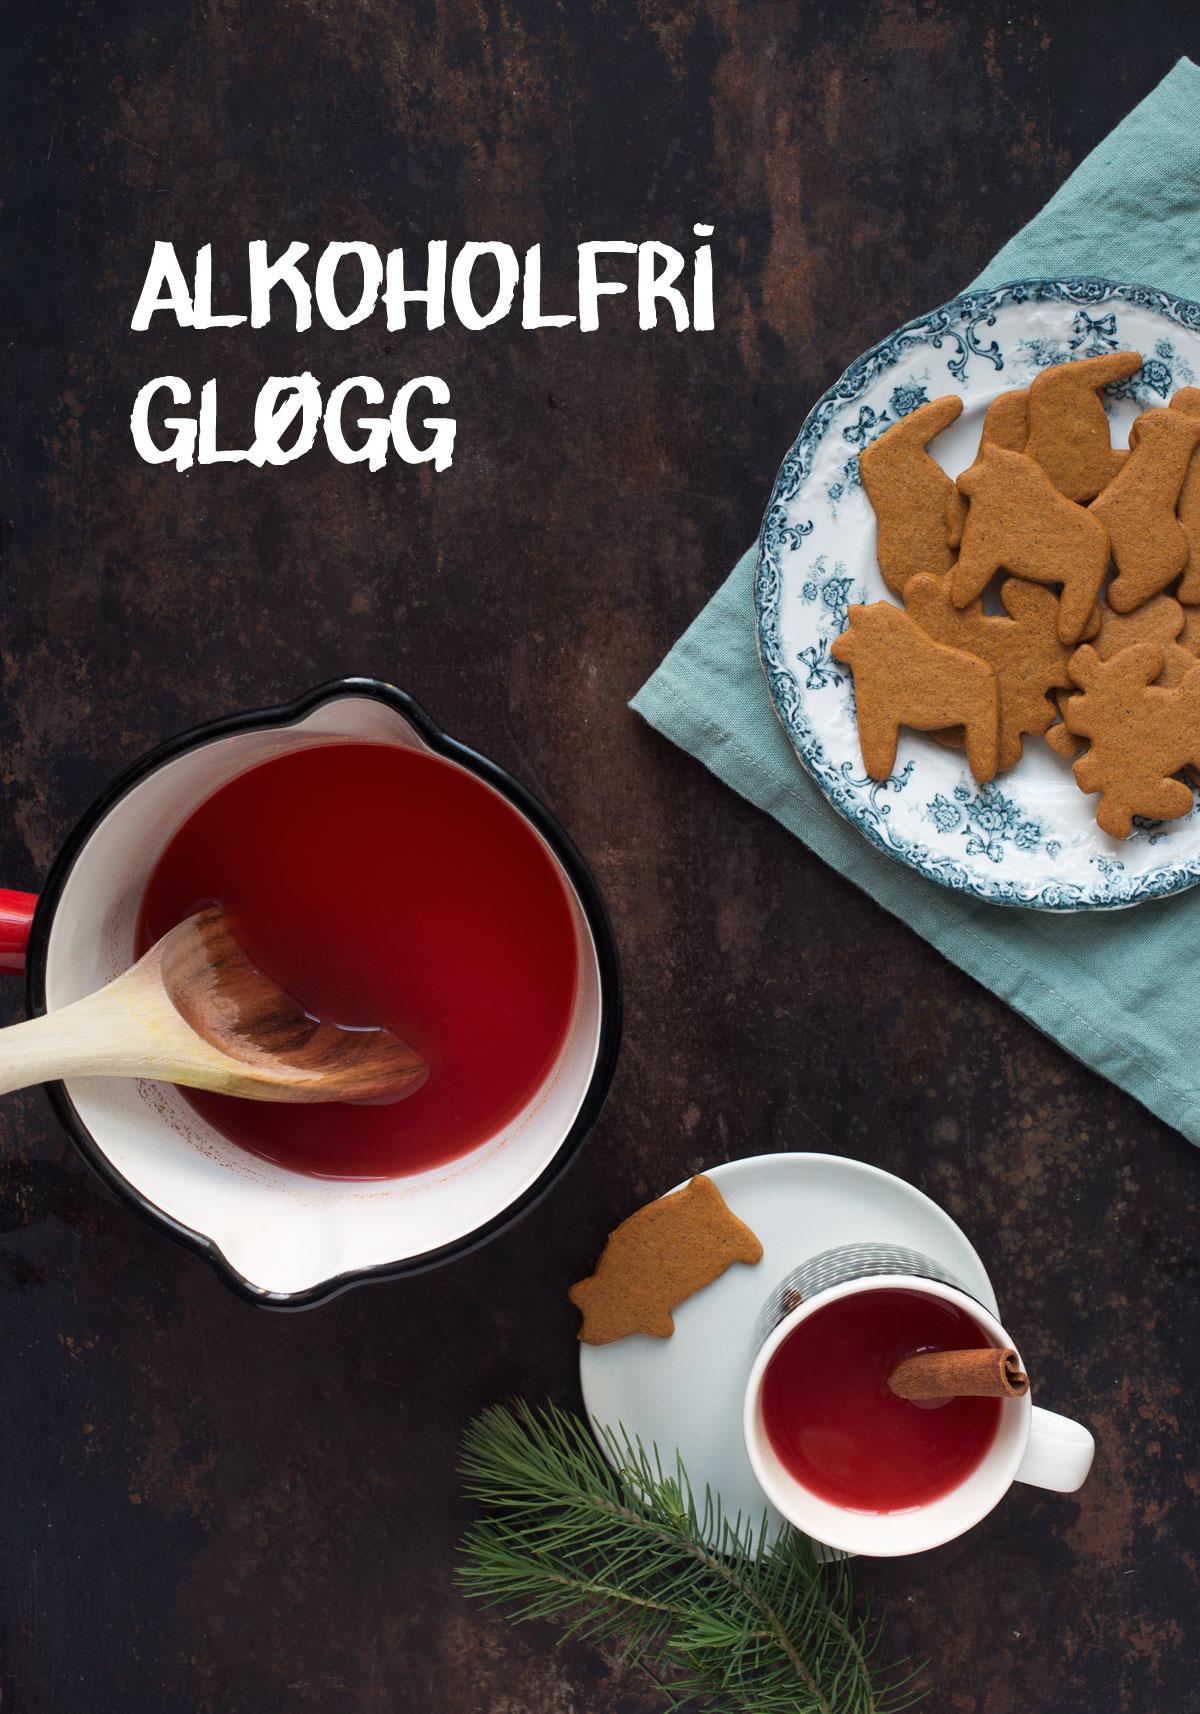 Opskrift: Alkoholfri gløgg med tranebær | Frk. Kræsen